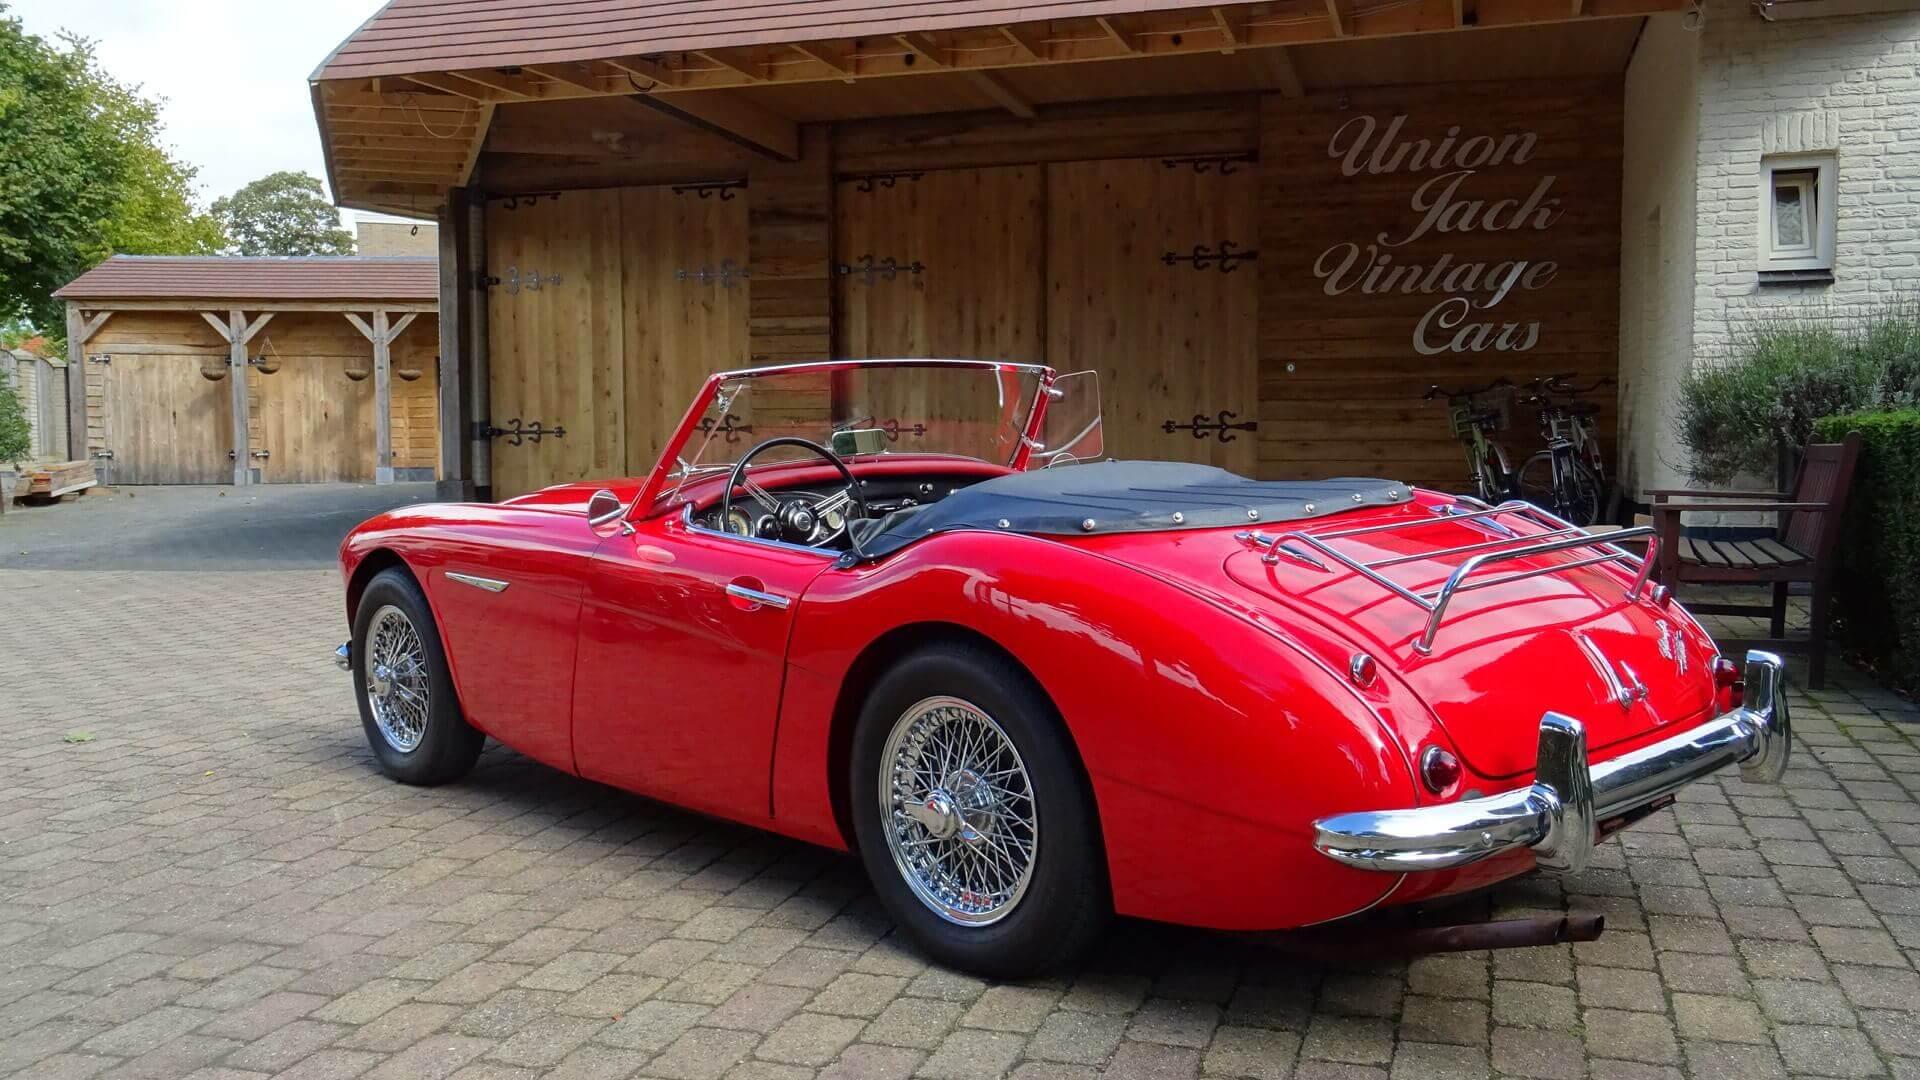 60 Austin-Healey 3000 MK 1 - Union Jack Vintage Cars